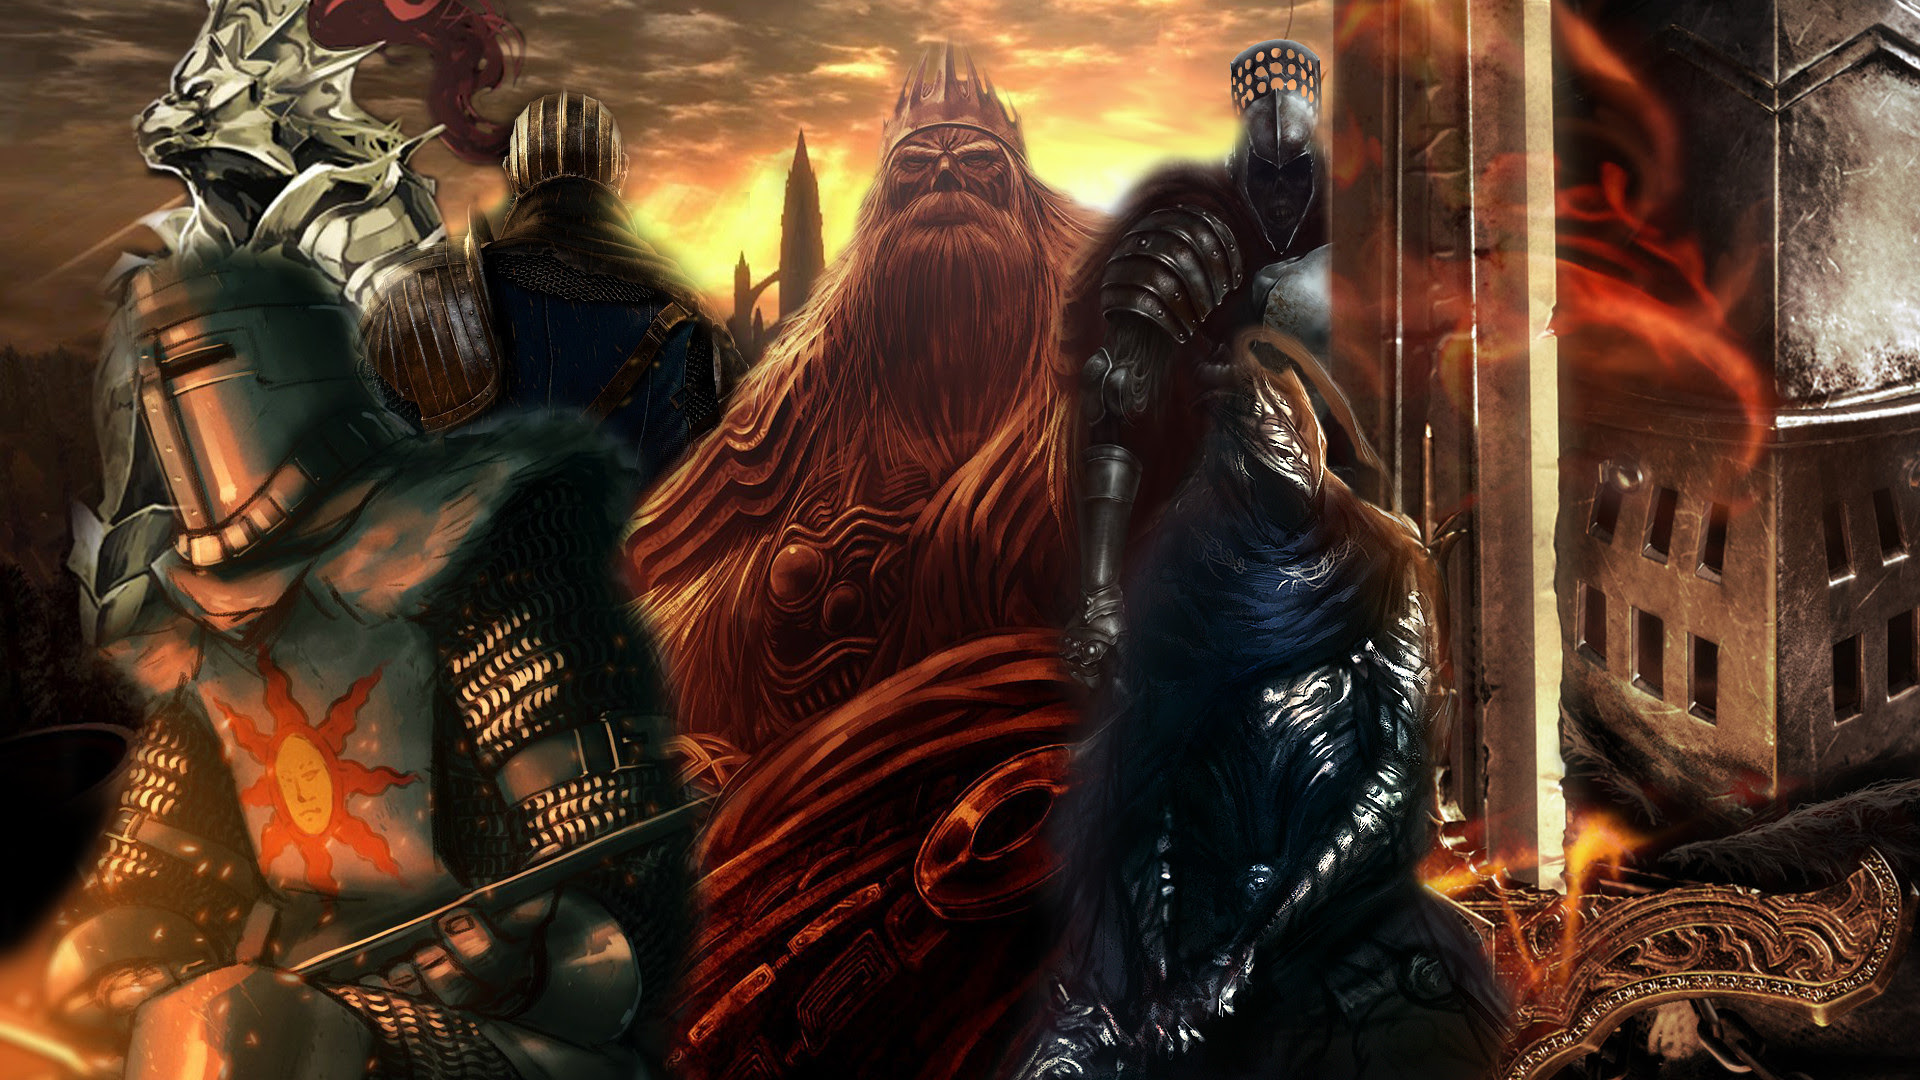 Created A Dark Souls Wallpaper Out Of My Favorite Fan Arts